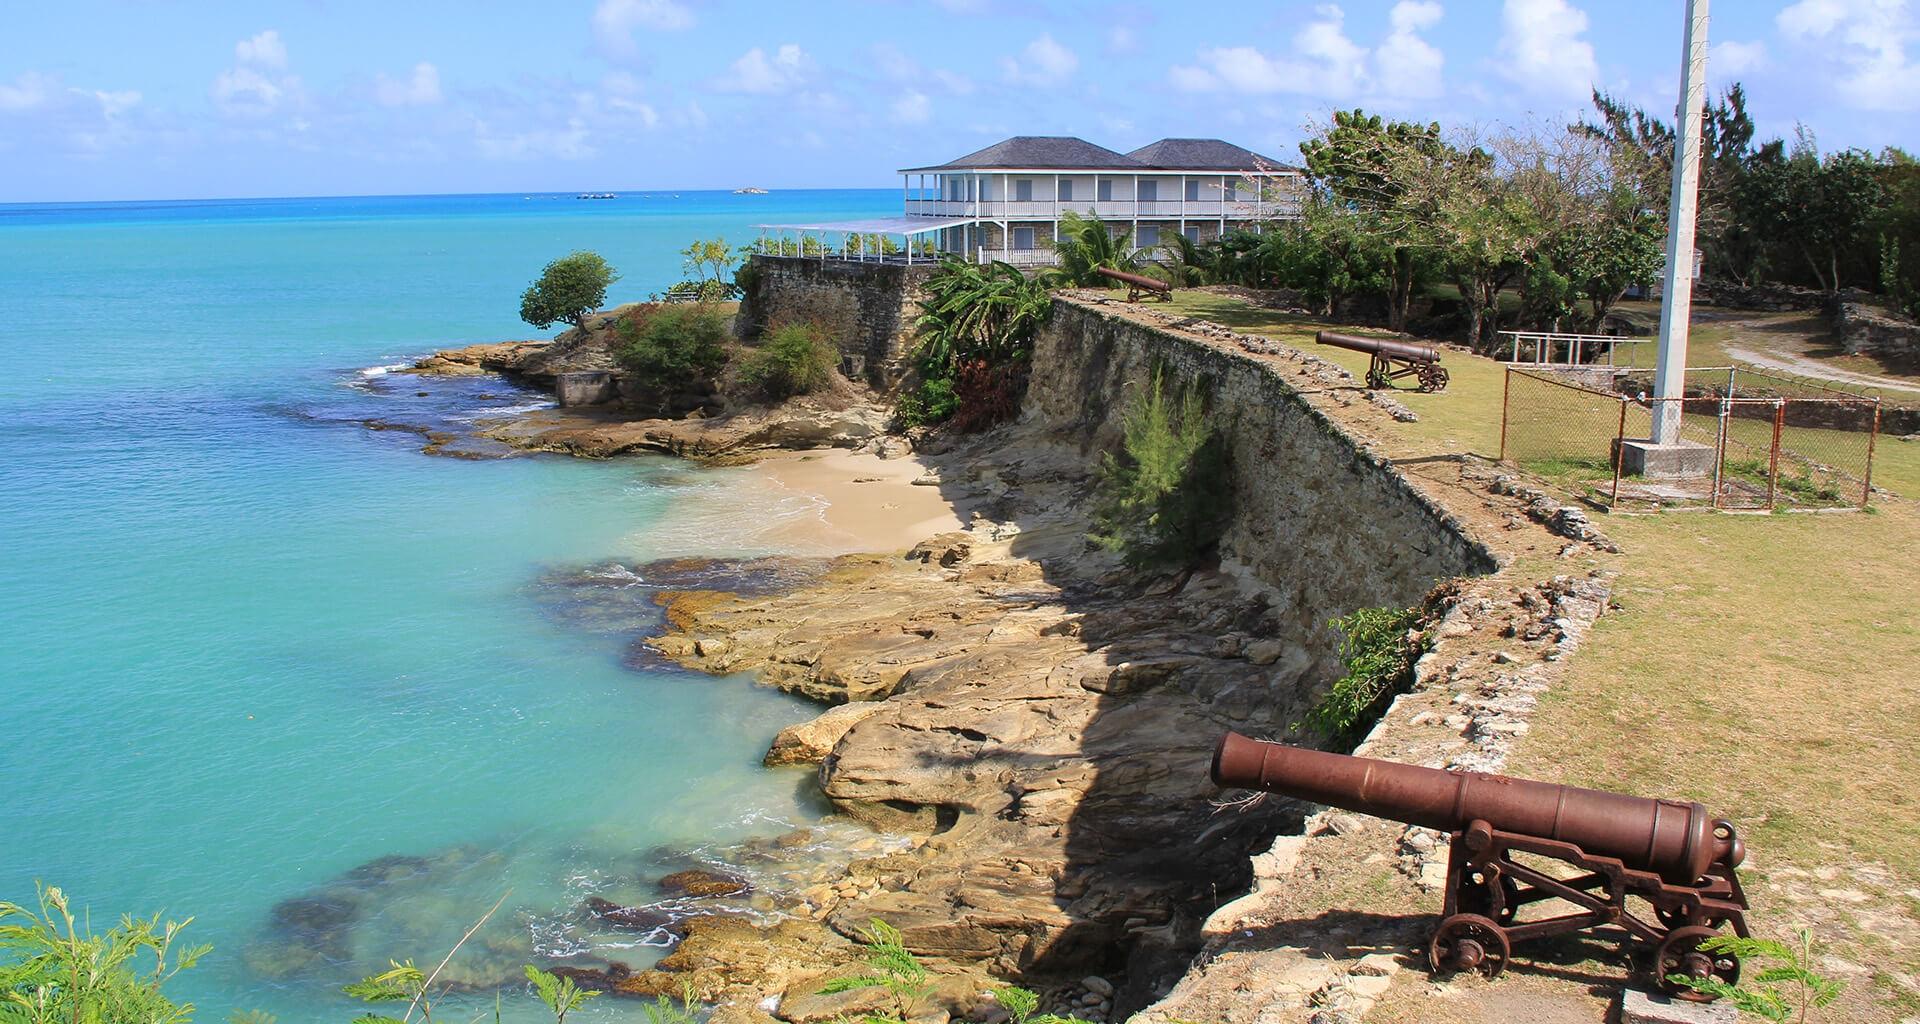 Antigua Image Gallery